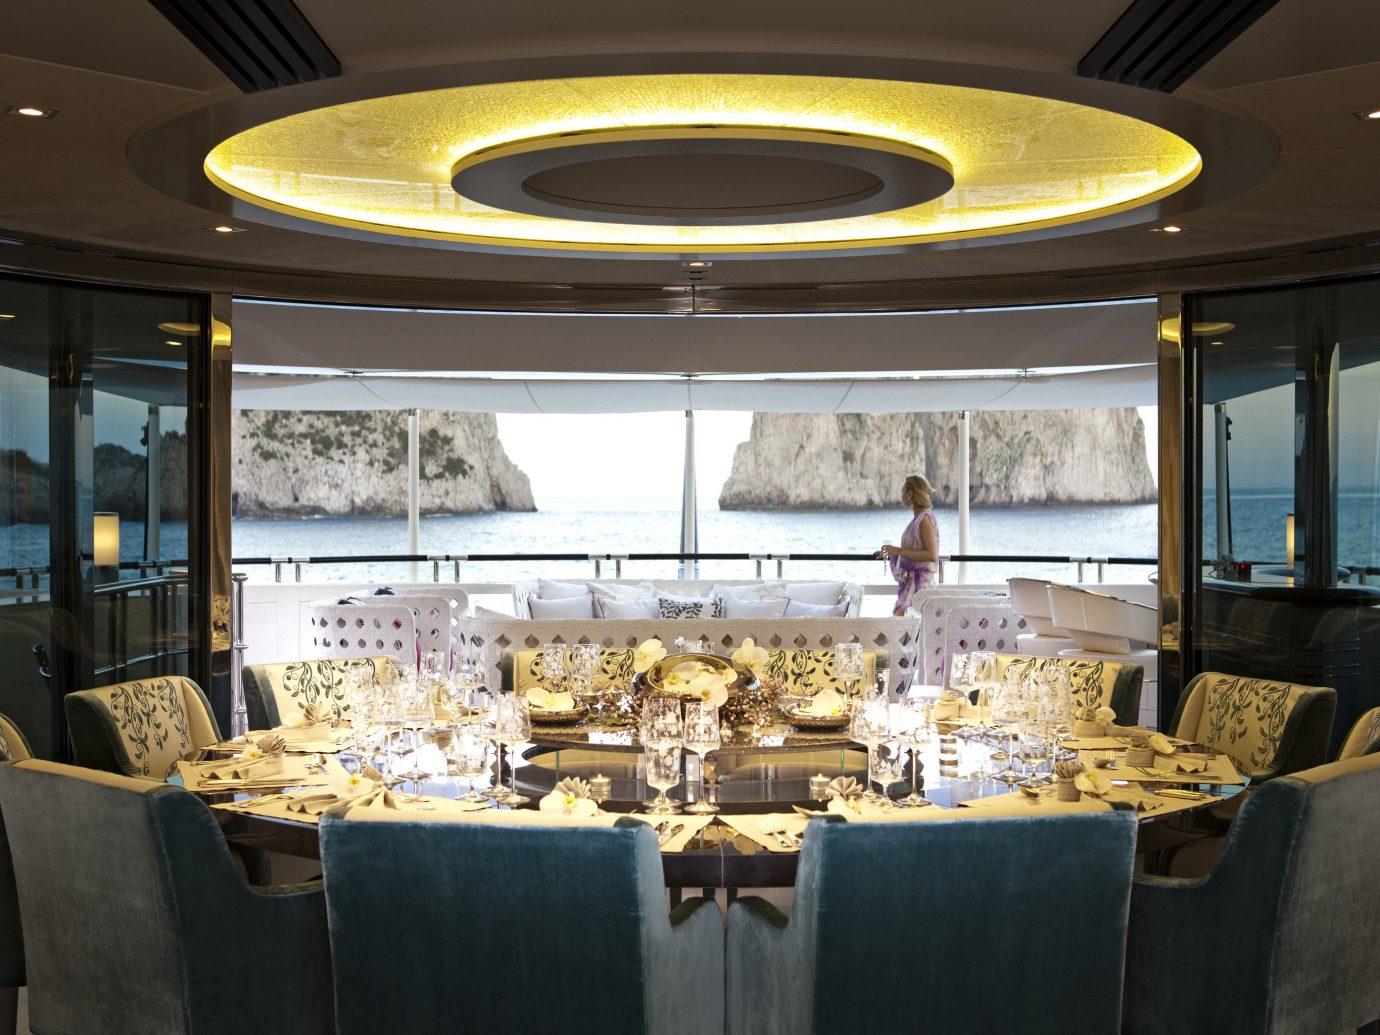 Luxury Travel Trip Ideas indoor Boat passenger ship ceiling vehicle window yacht luxury yacht room function hall interior design watercraft meal estate ship restaurant furniture